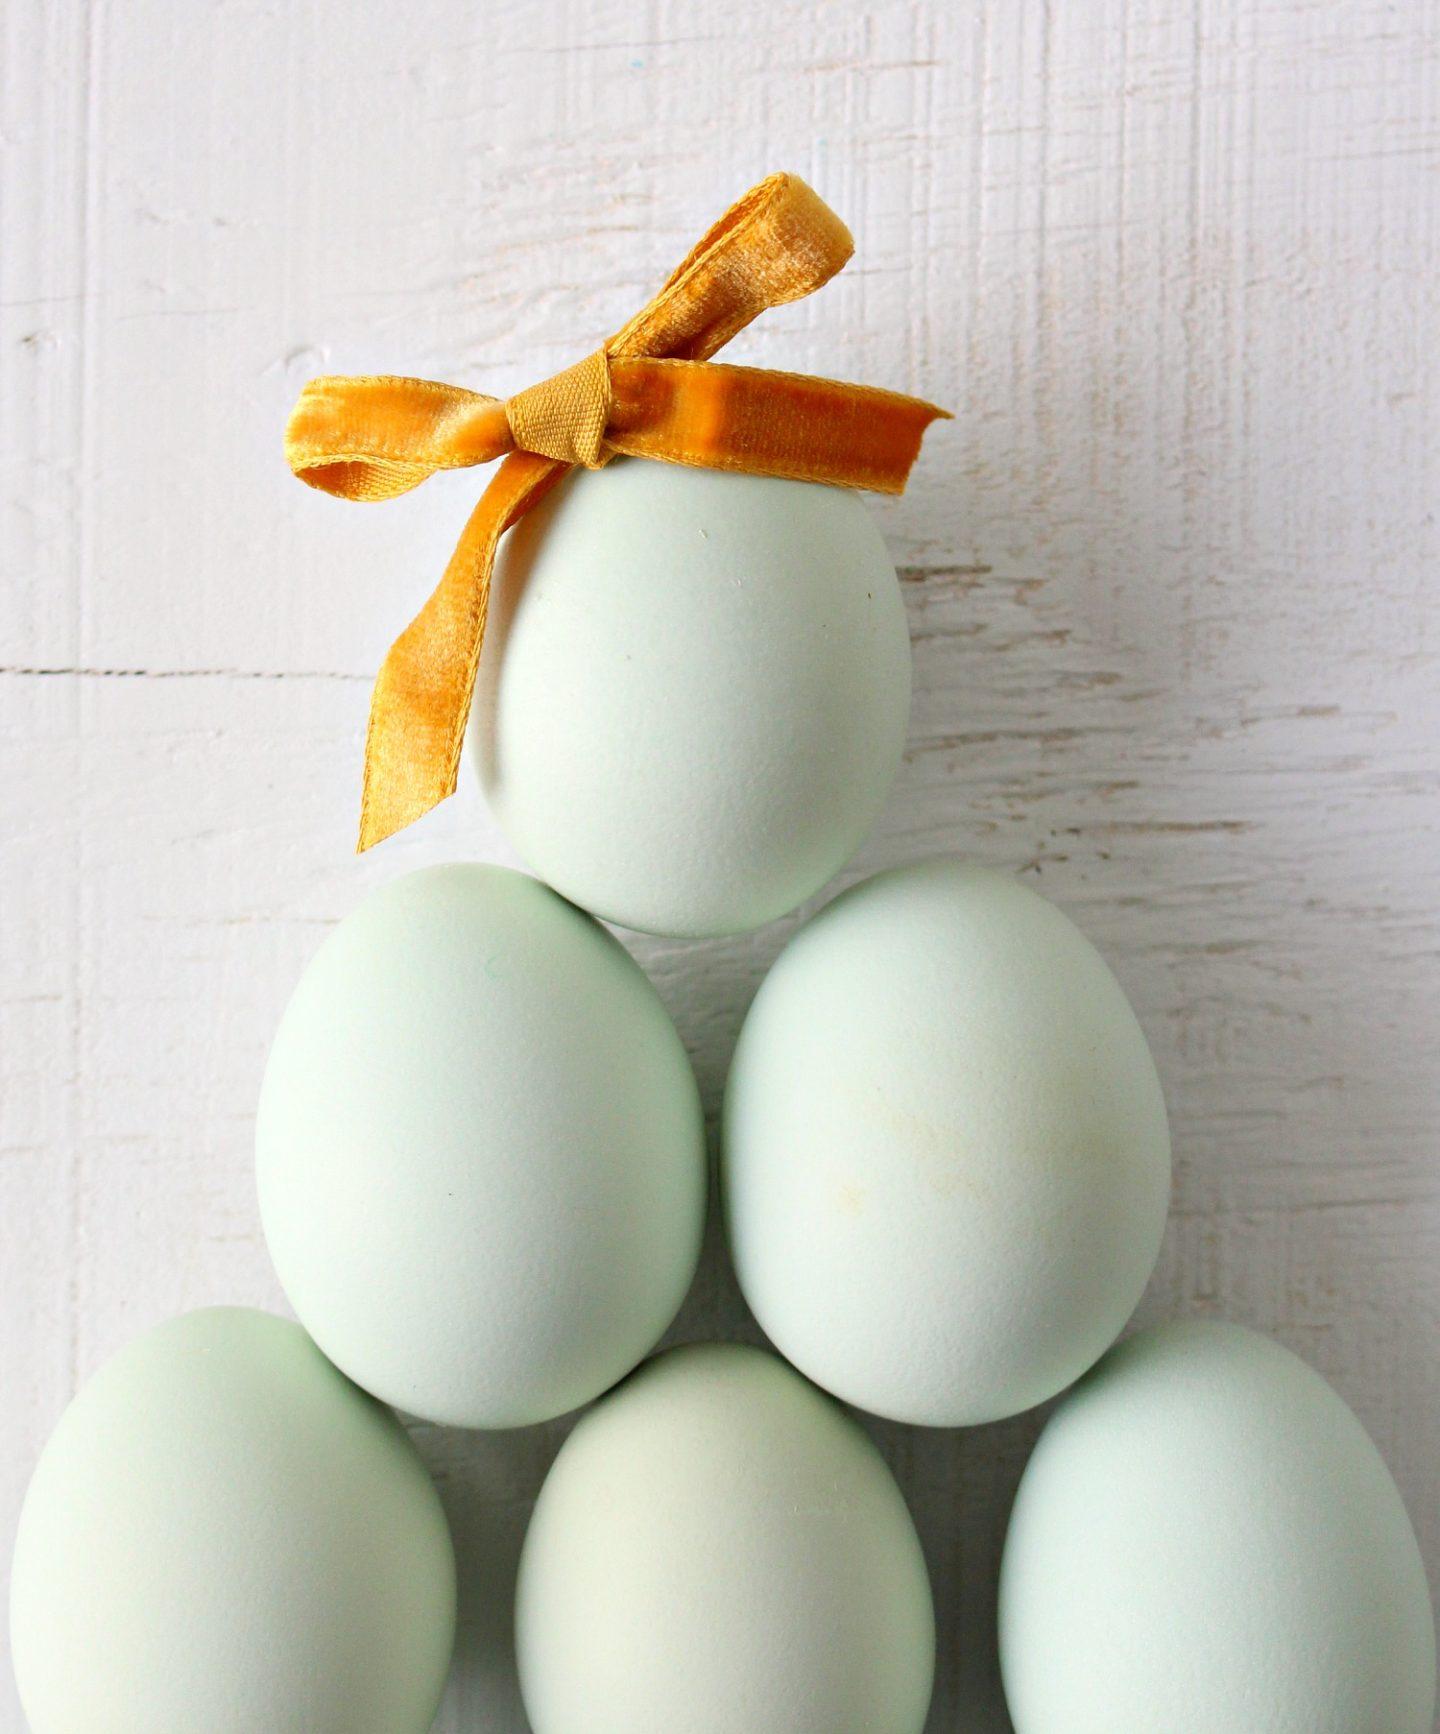 Tree Shaped Eggs